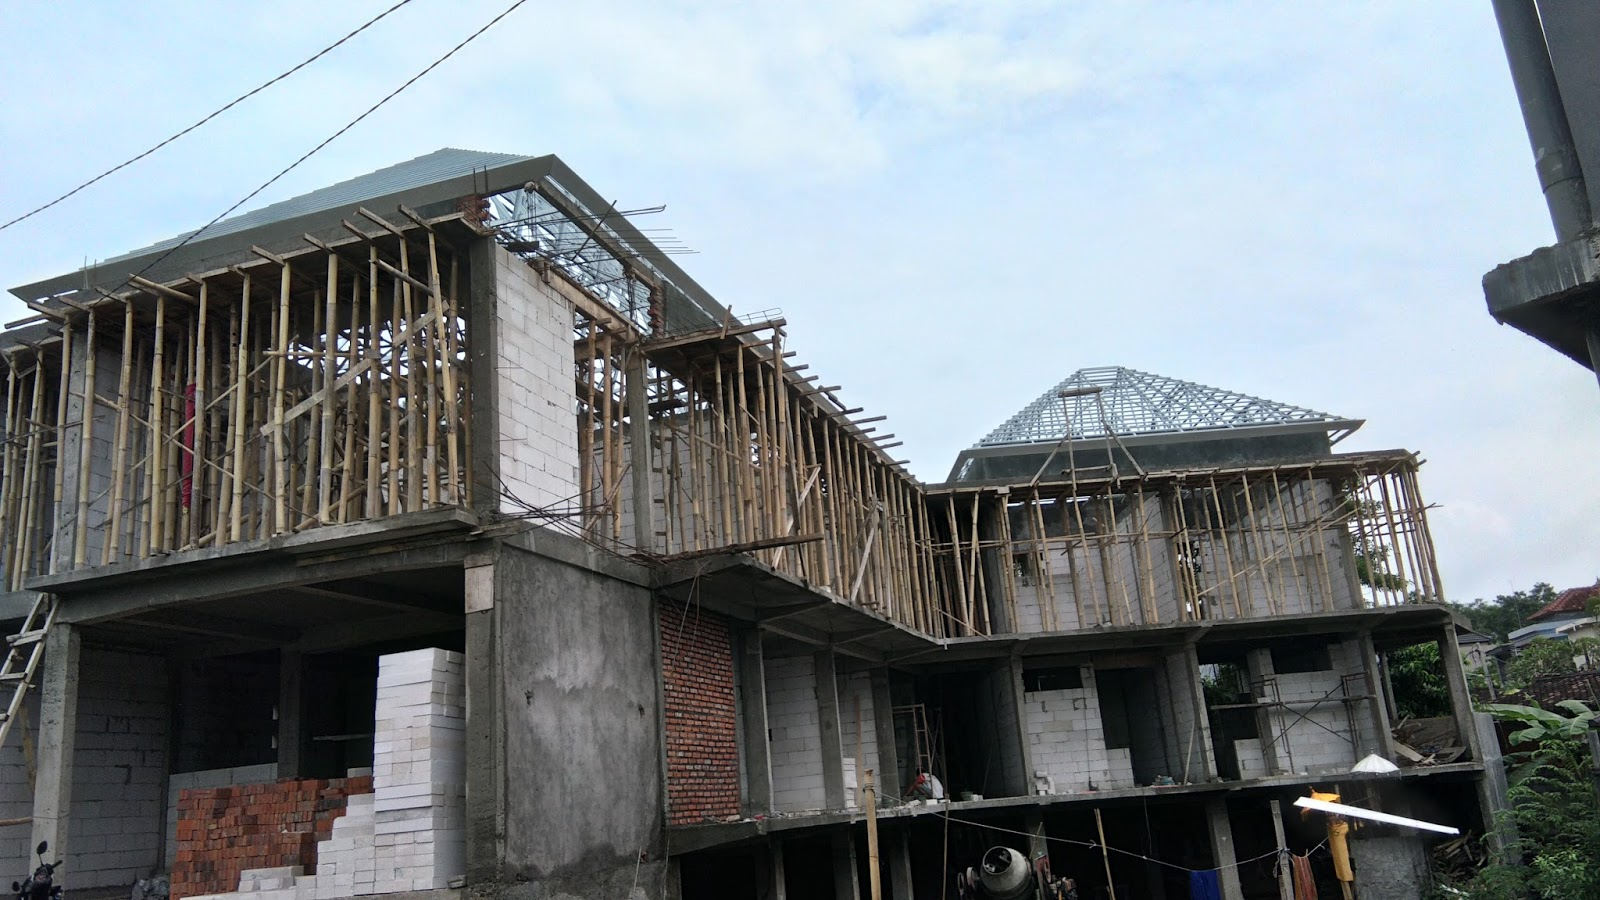 Harga Kap Baja Ringan Di Bali Jual Murah Denpasar